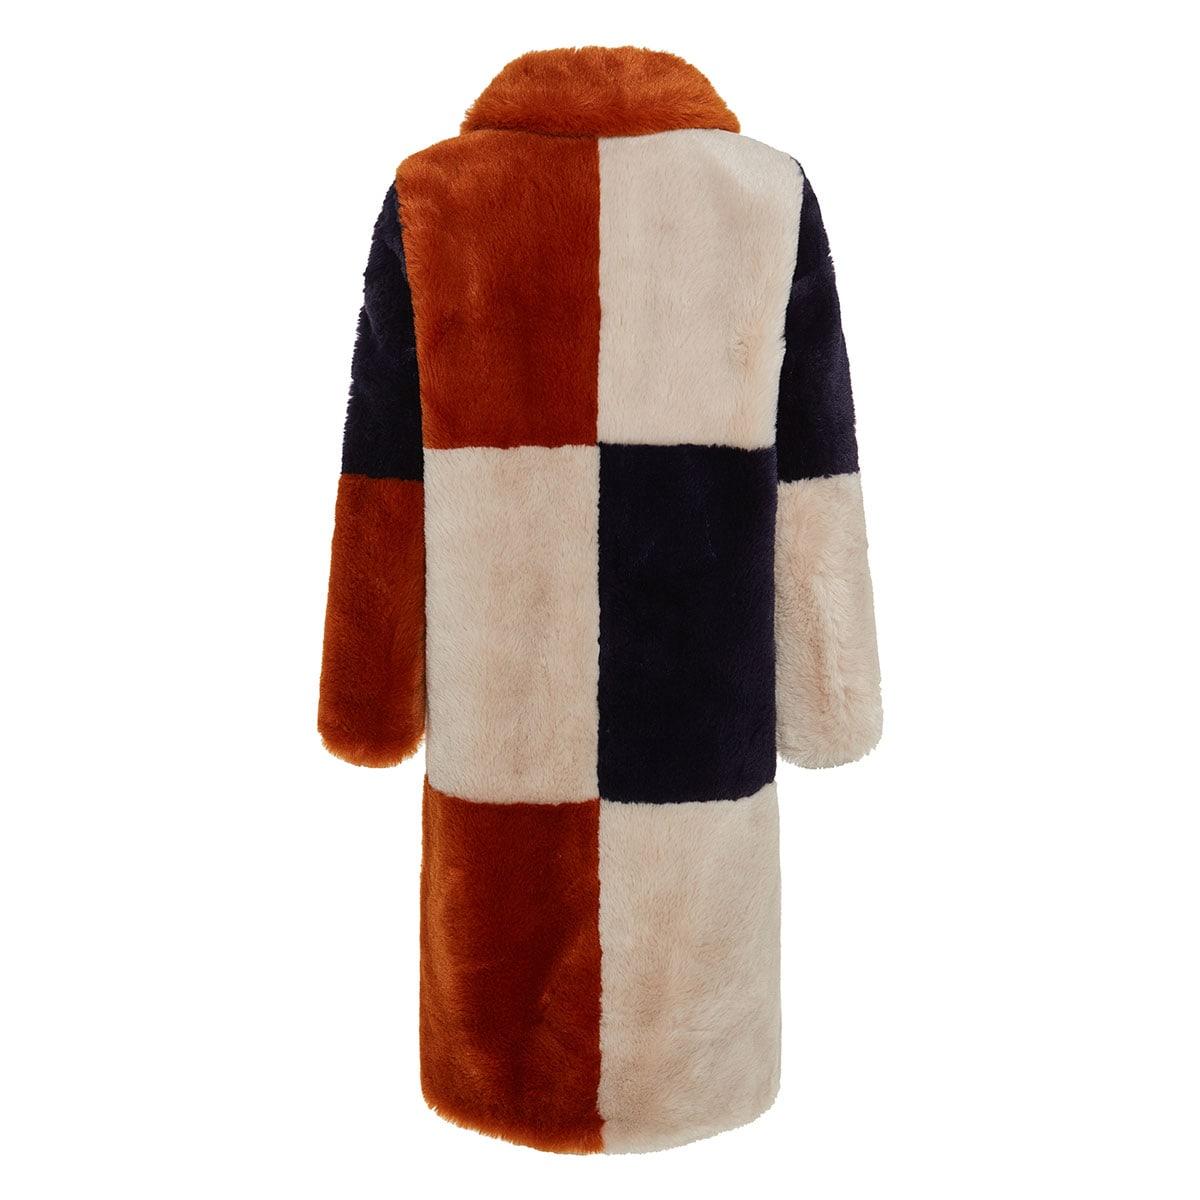 Adalyn faux fur patchwork coat